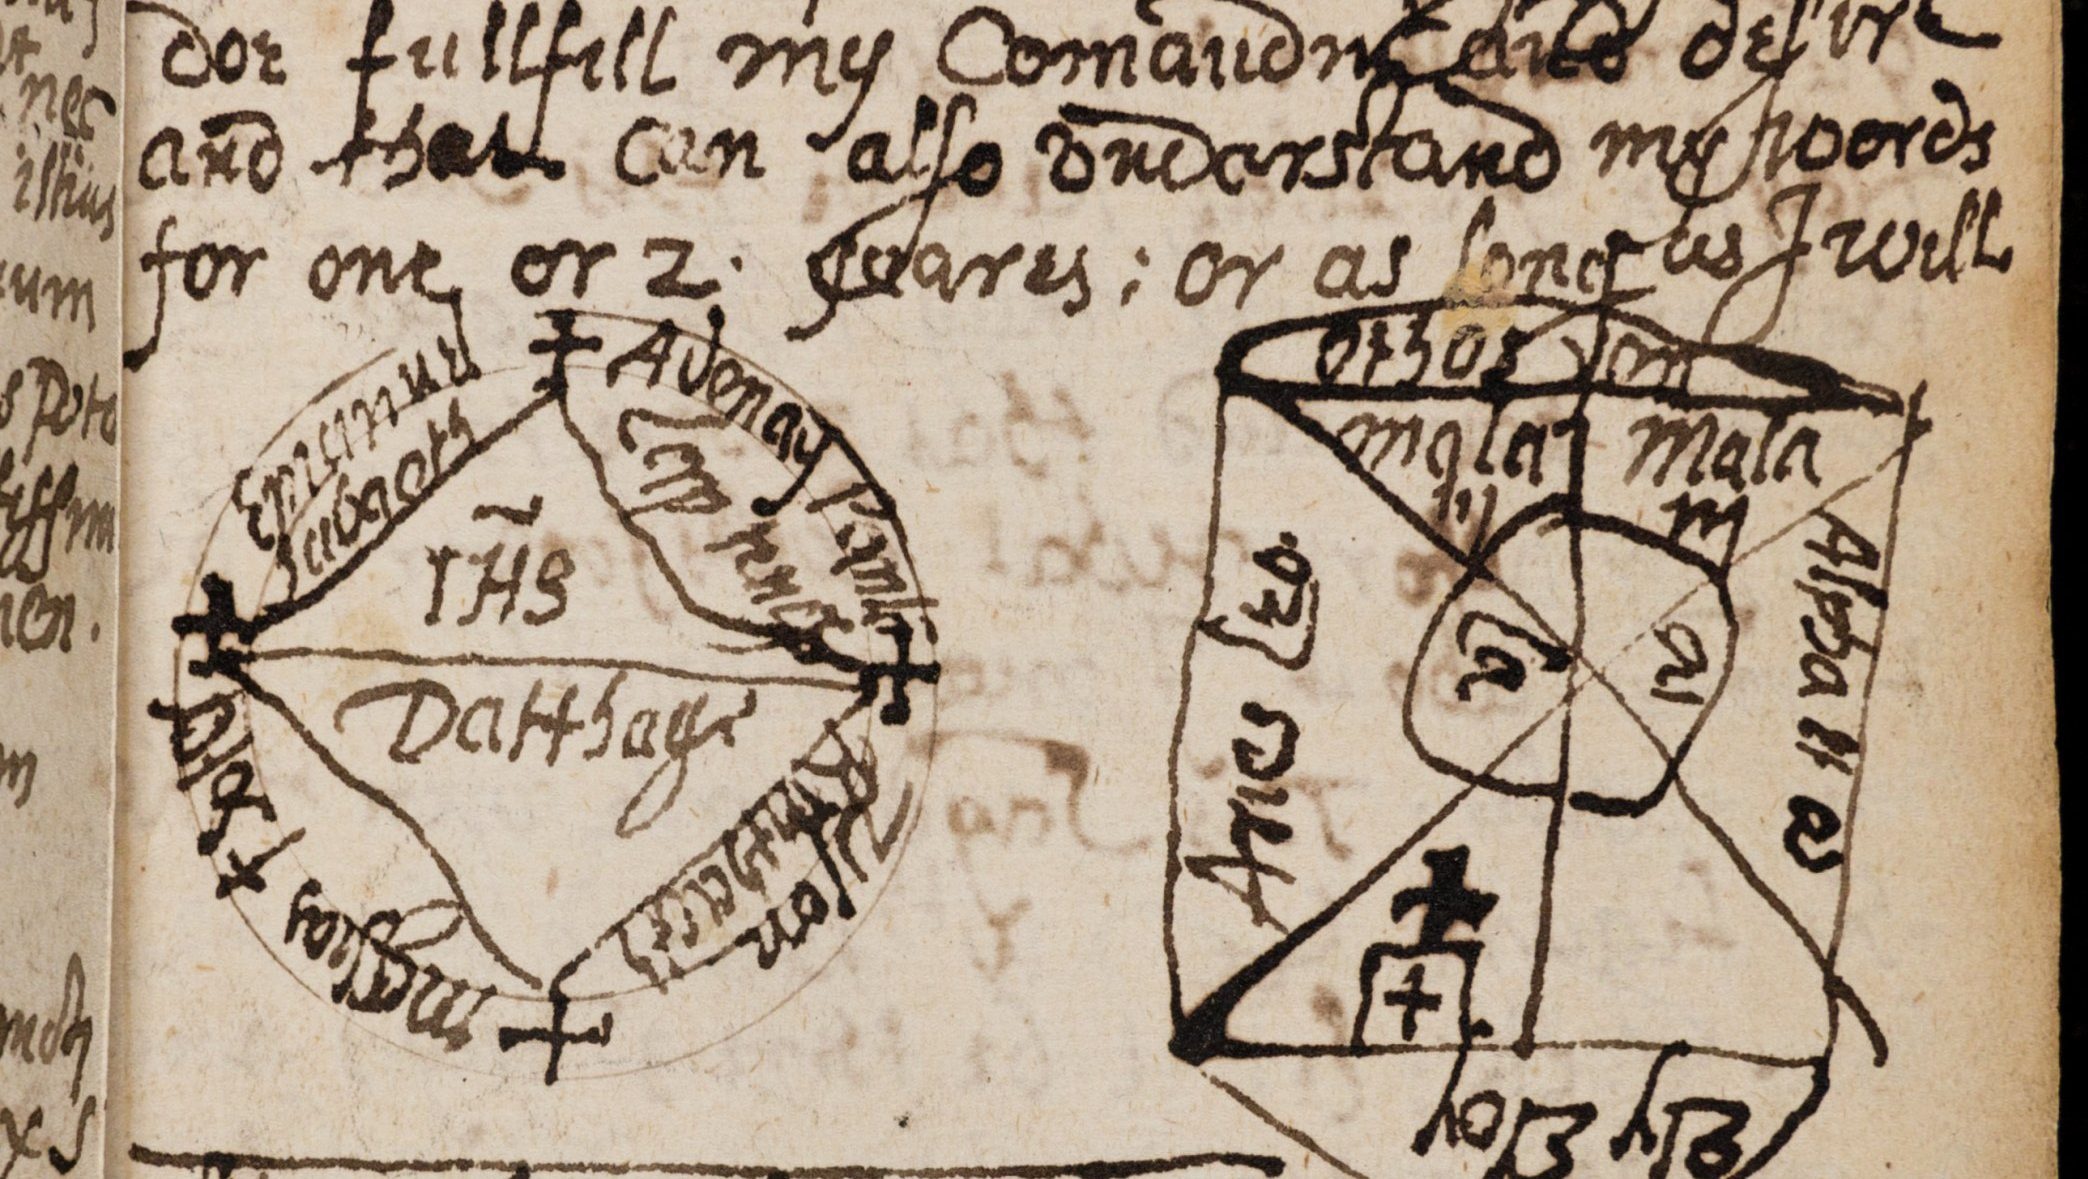 Rare spellbook manuscript details how witchcraft was done in the rare spellbook manuscript details how witchcraft was done in the 17th century quartz biocorpaavc Choice Image